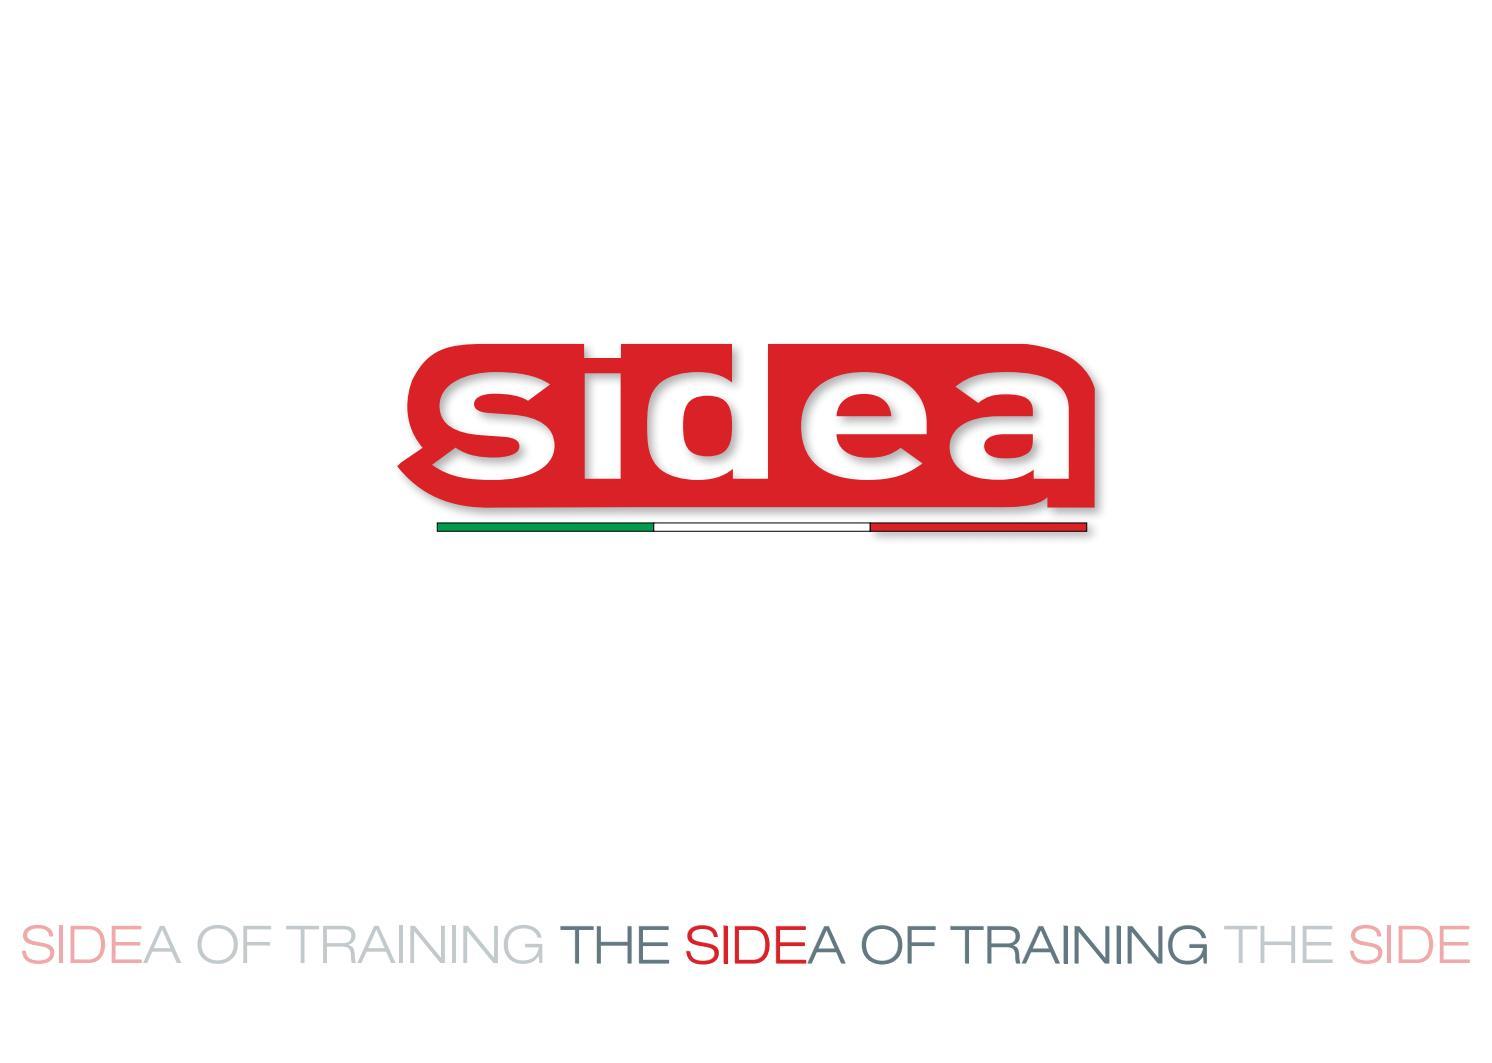 ac538d941aa9 NEW Sidea Product Catalog 2017 by Sidea Fitness Company - issuu